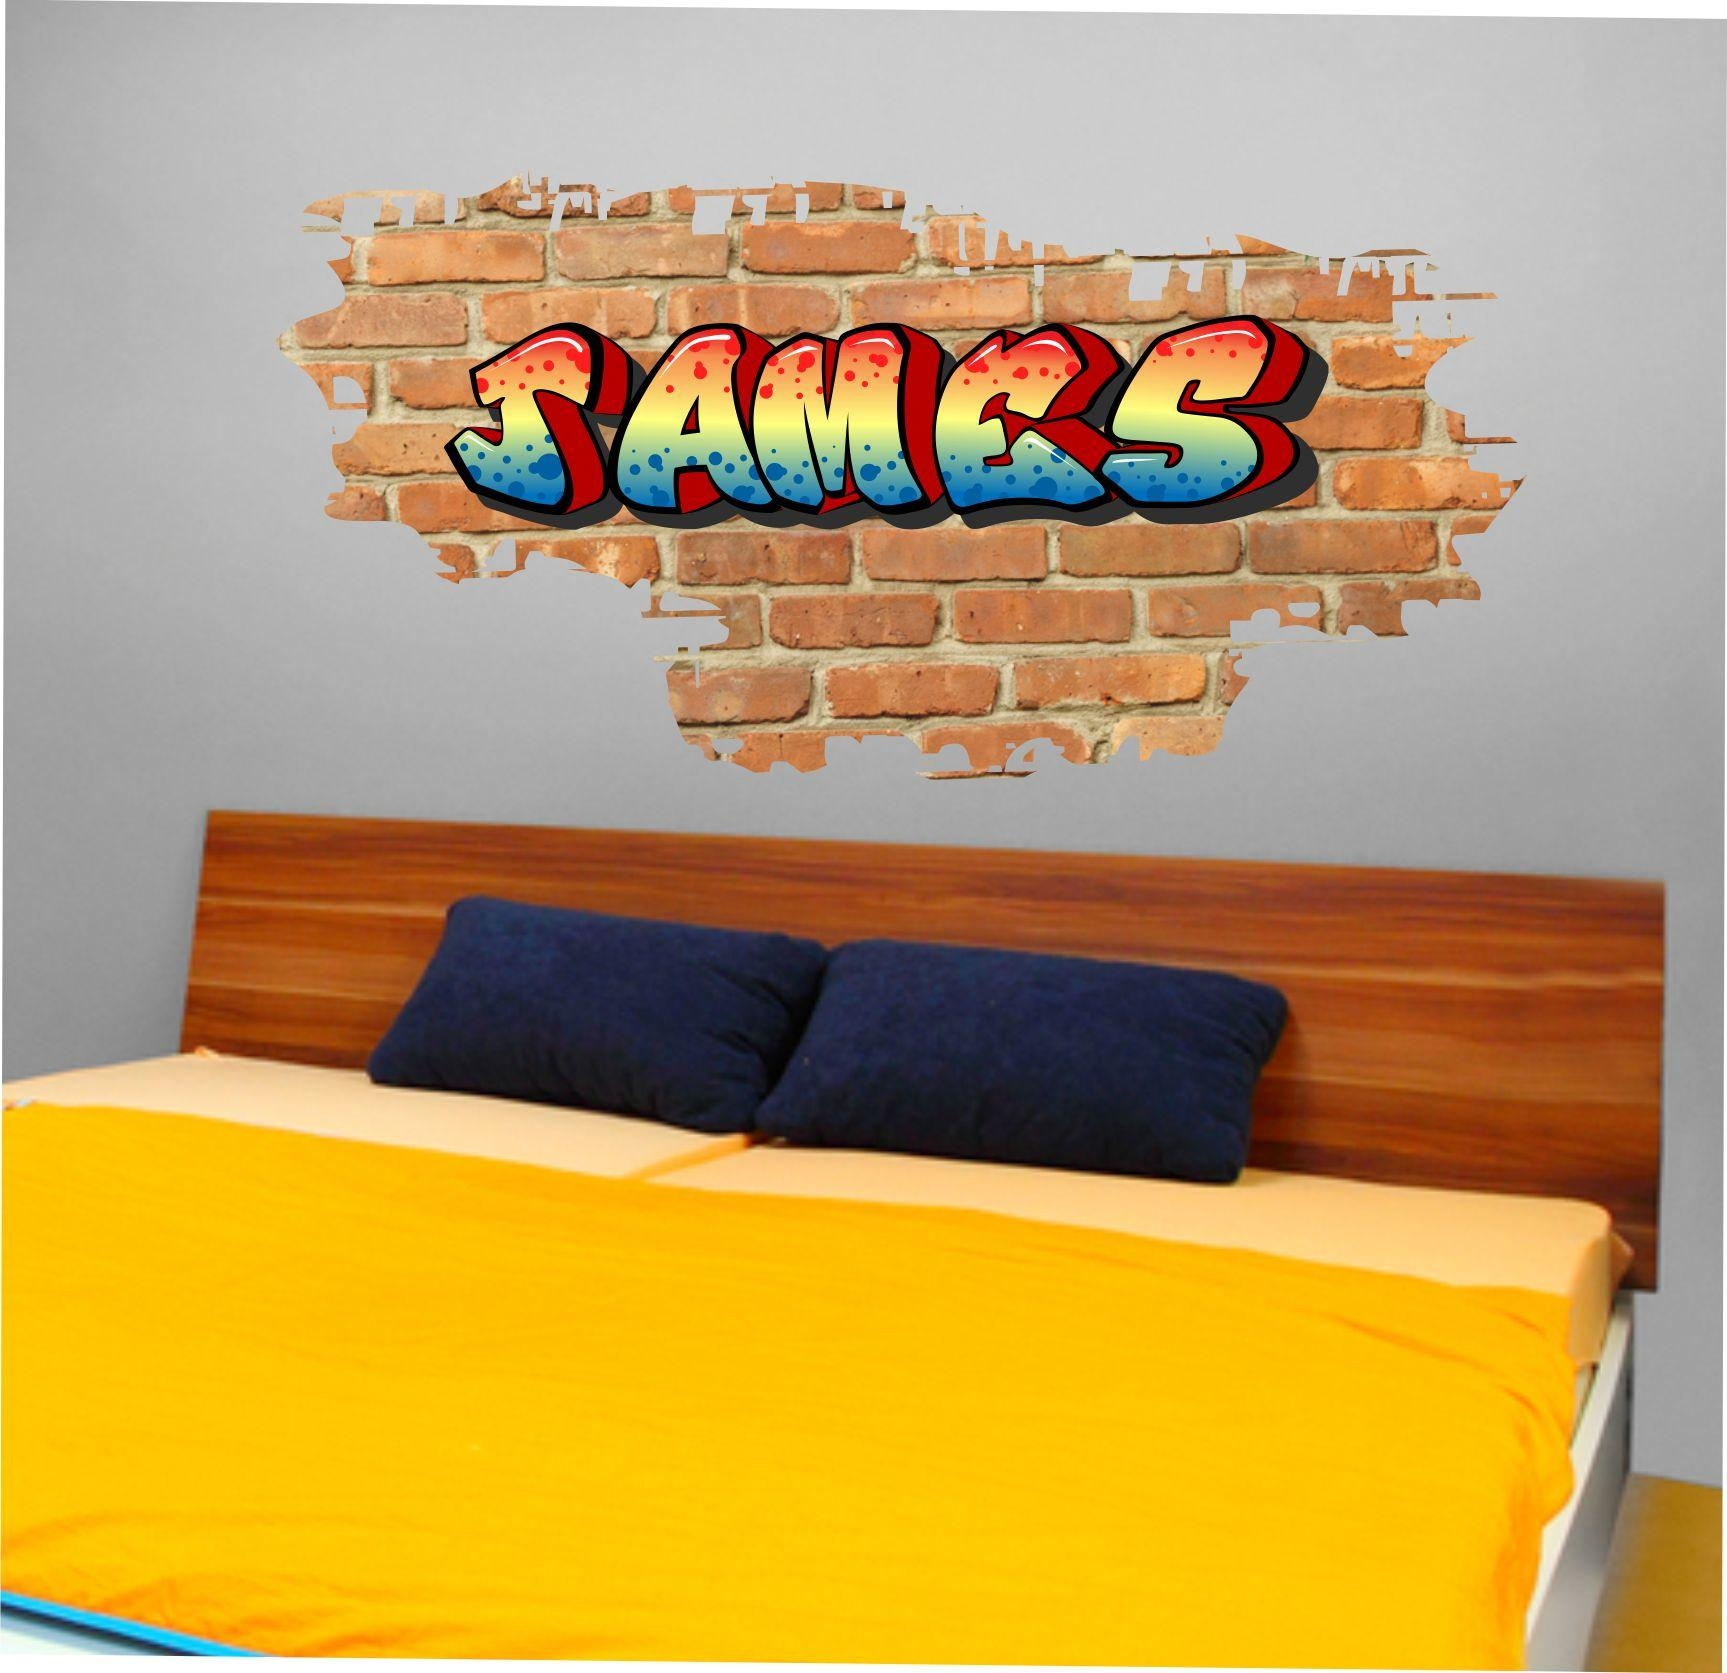 The Grafix Studio   01 Personalised Graffiti Brick & Name Wall Sticker In Graffiti Wall Art Stickers (Image 15 of 20)